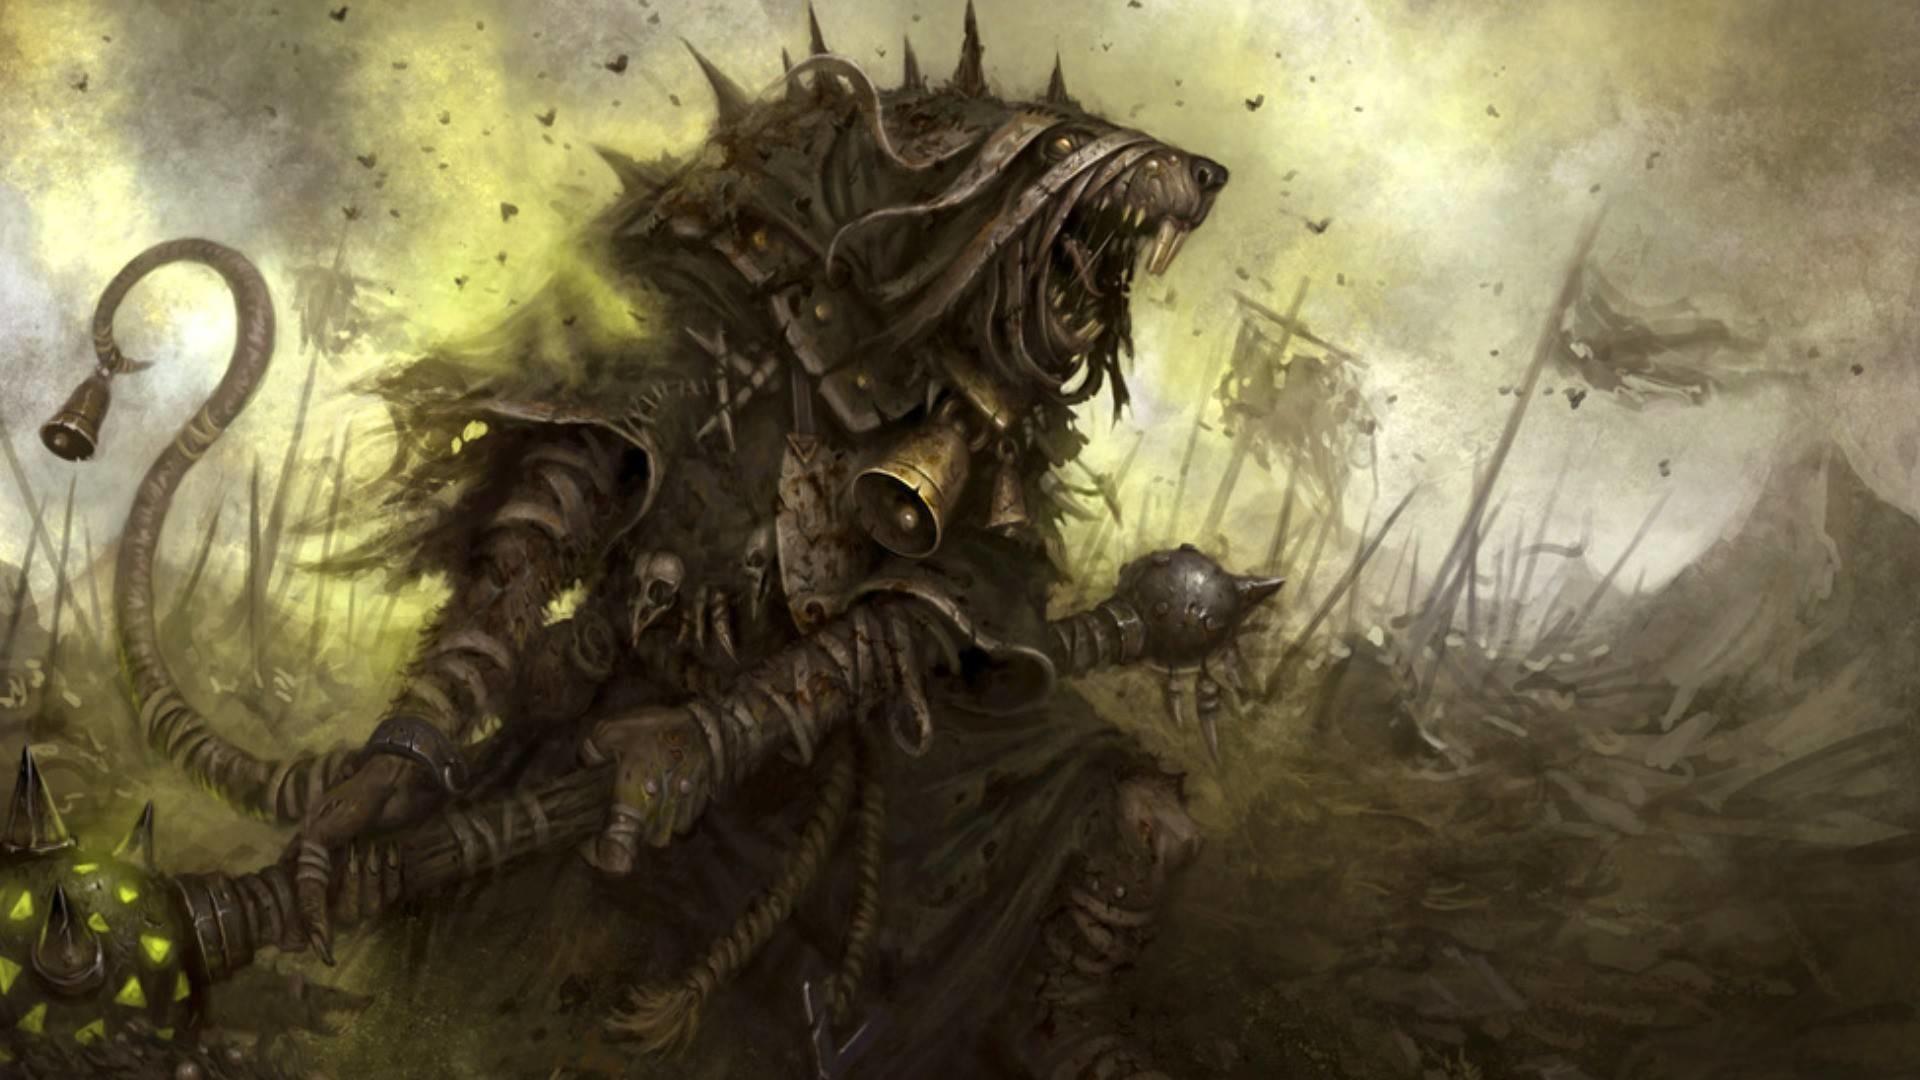 Image – Warhammer-fantasy-1920×1080-wallpaper-2368751.jpg | Warhammer Wiki  | FANDOM powered by Wikia